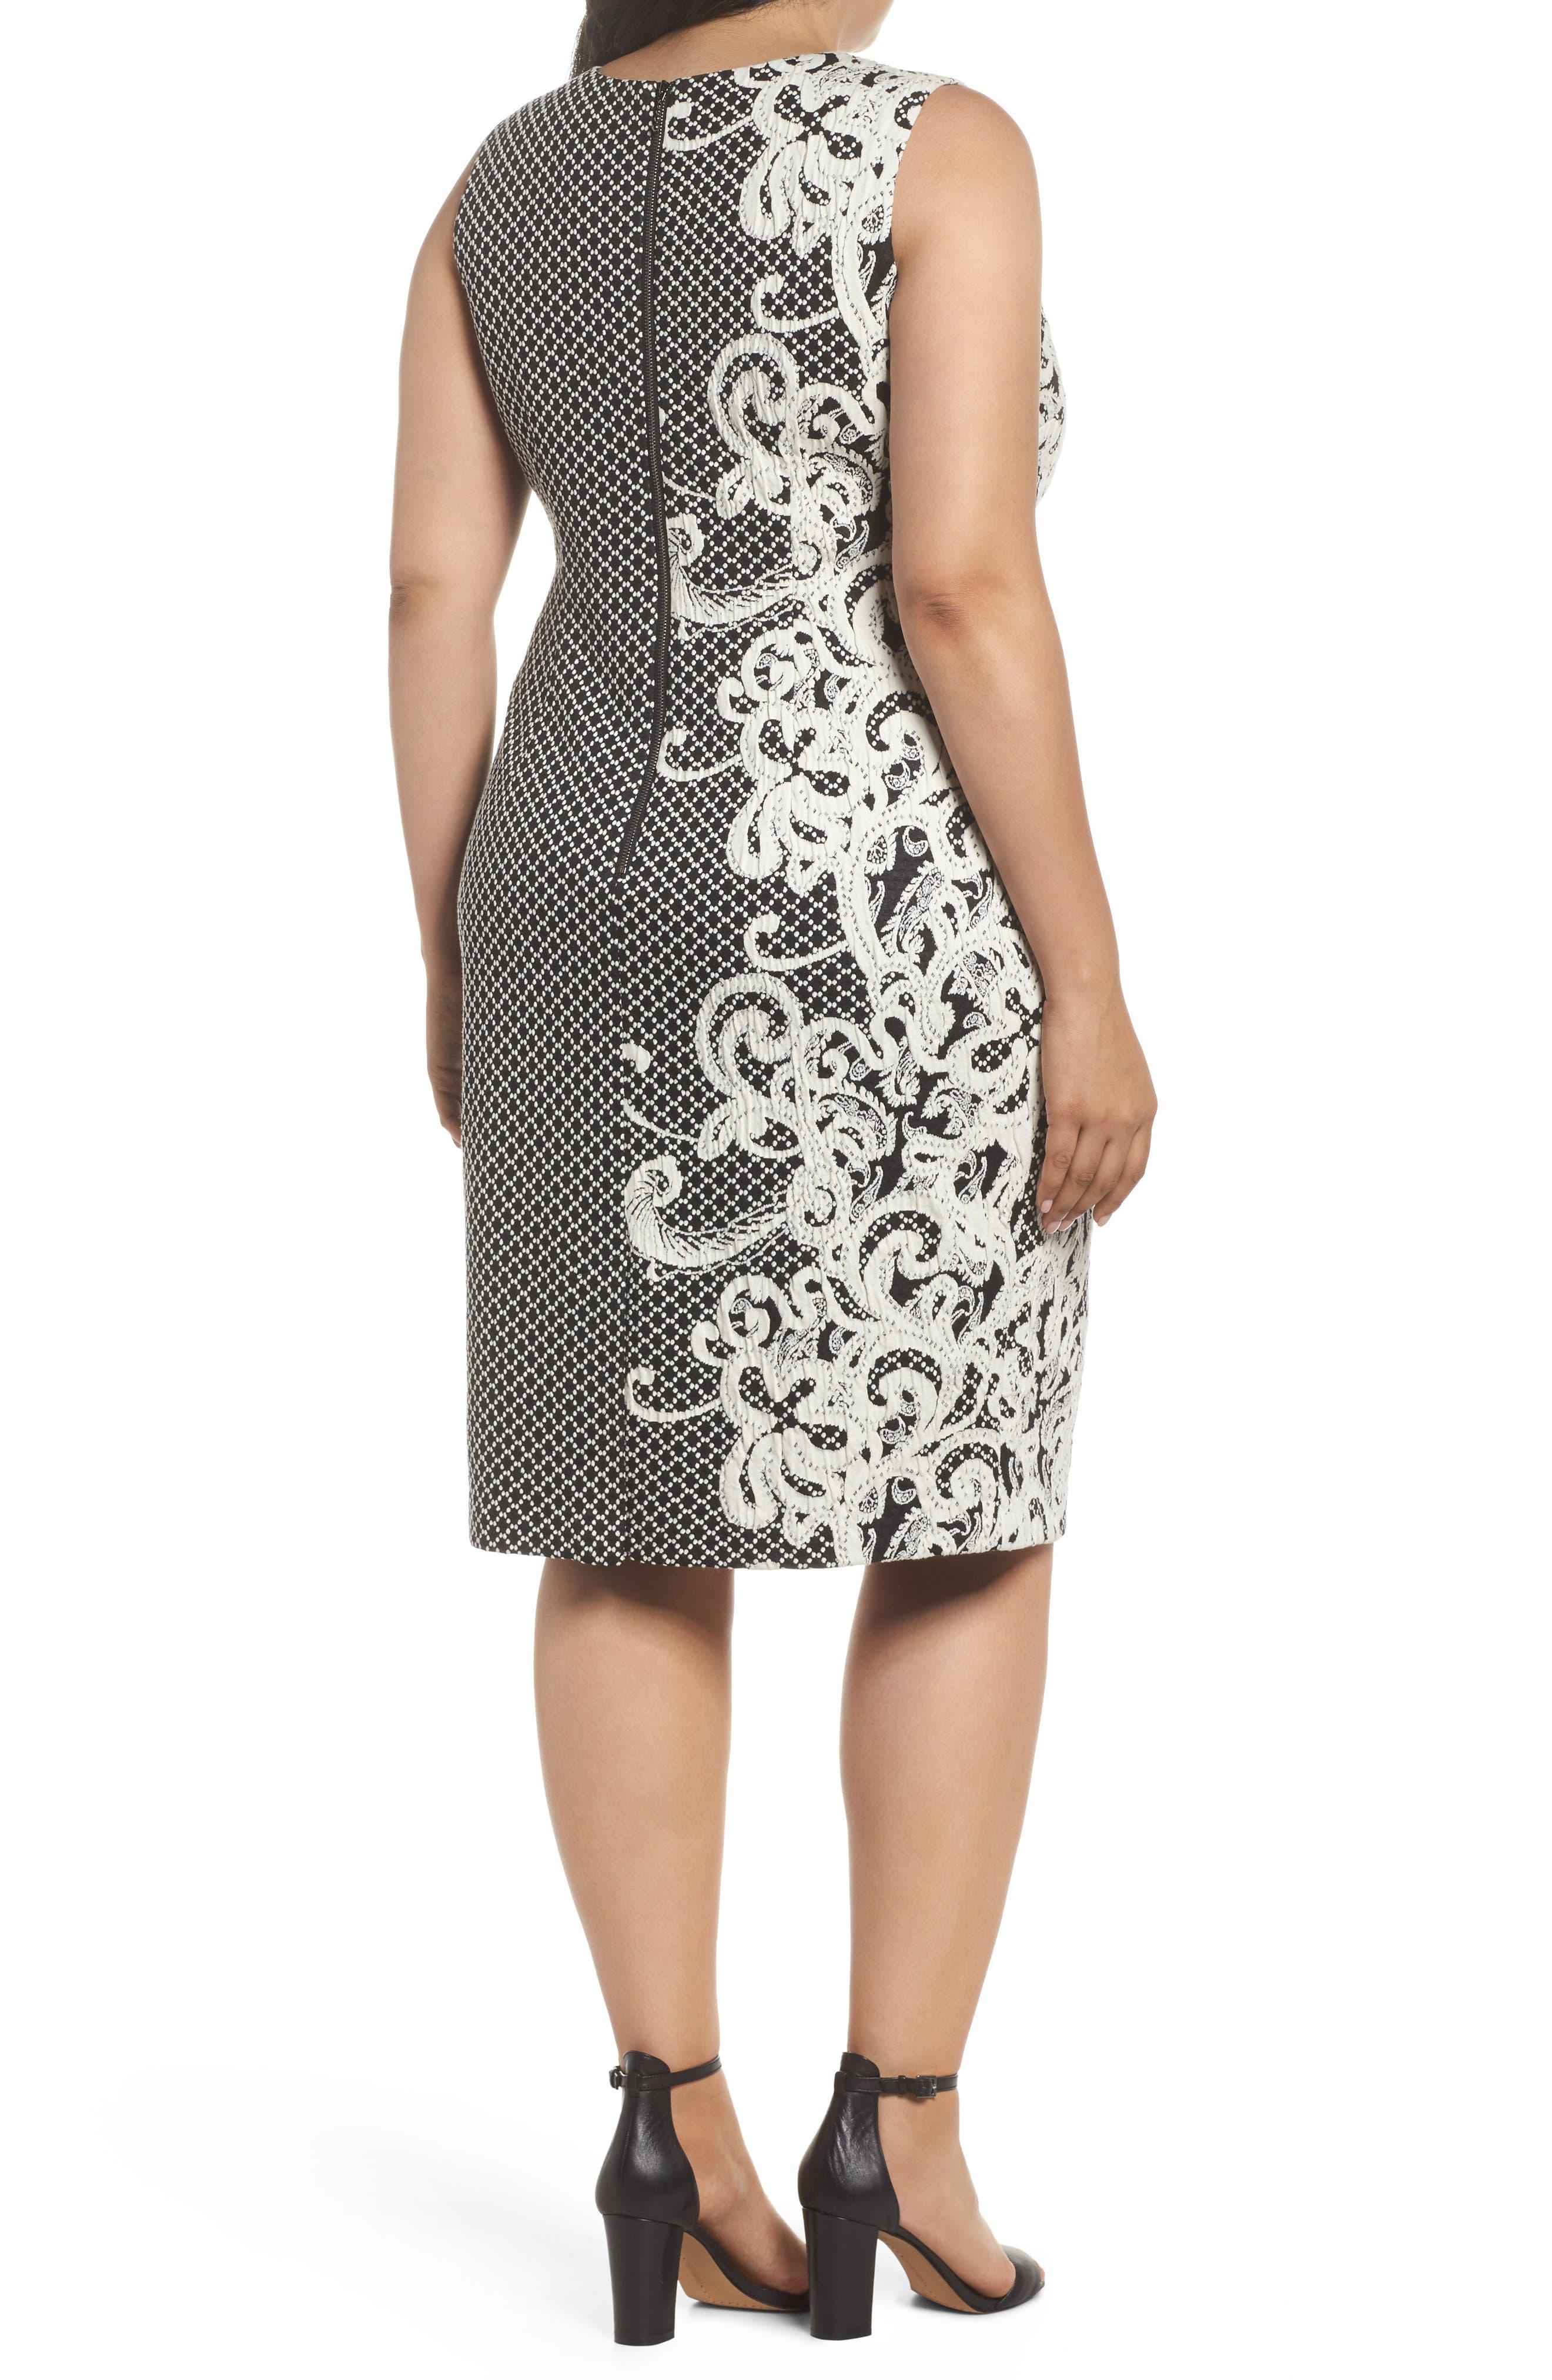 Scroll Border Knit Sheath Dress,                             Alternate thumbnail 2, color,                             Black/ Ivory